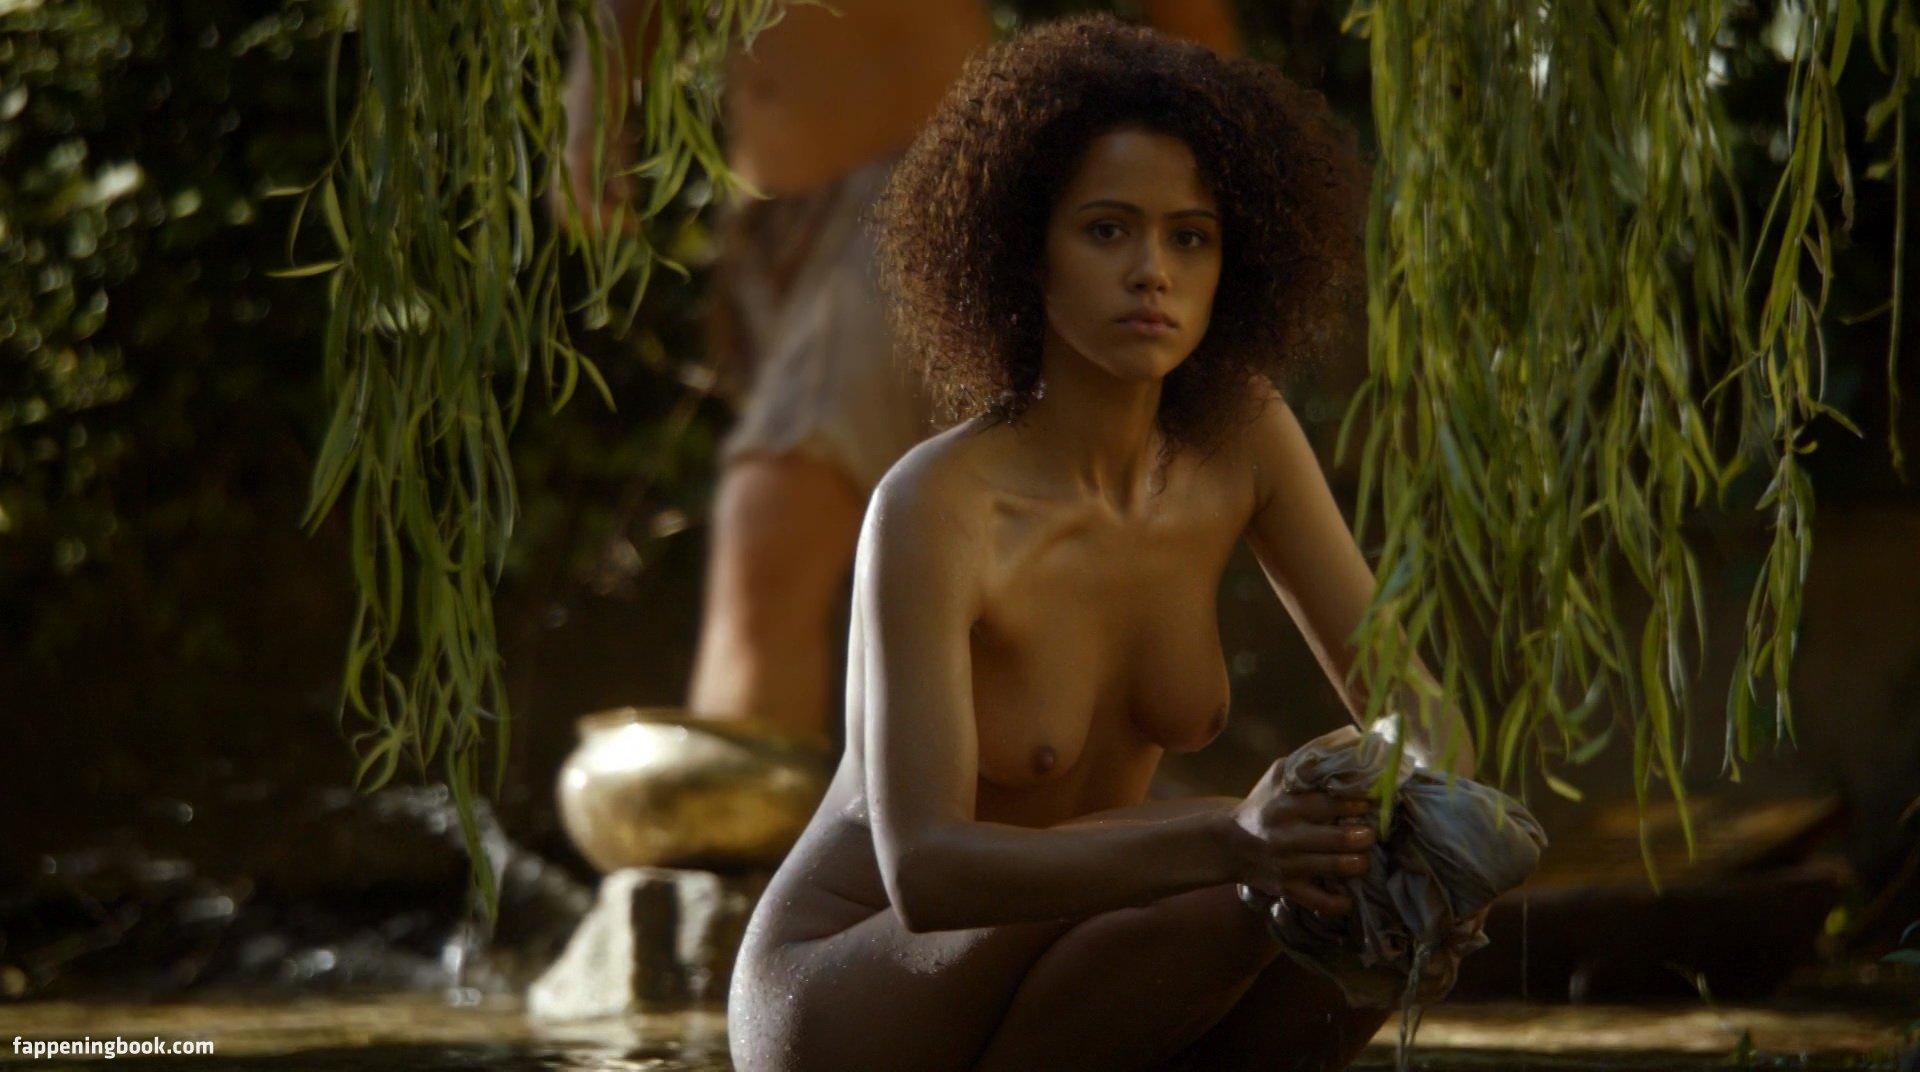 Anastasia Baranova Naked nathalie emmanuel nude, sexy, the fappening, uncensored